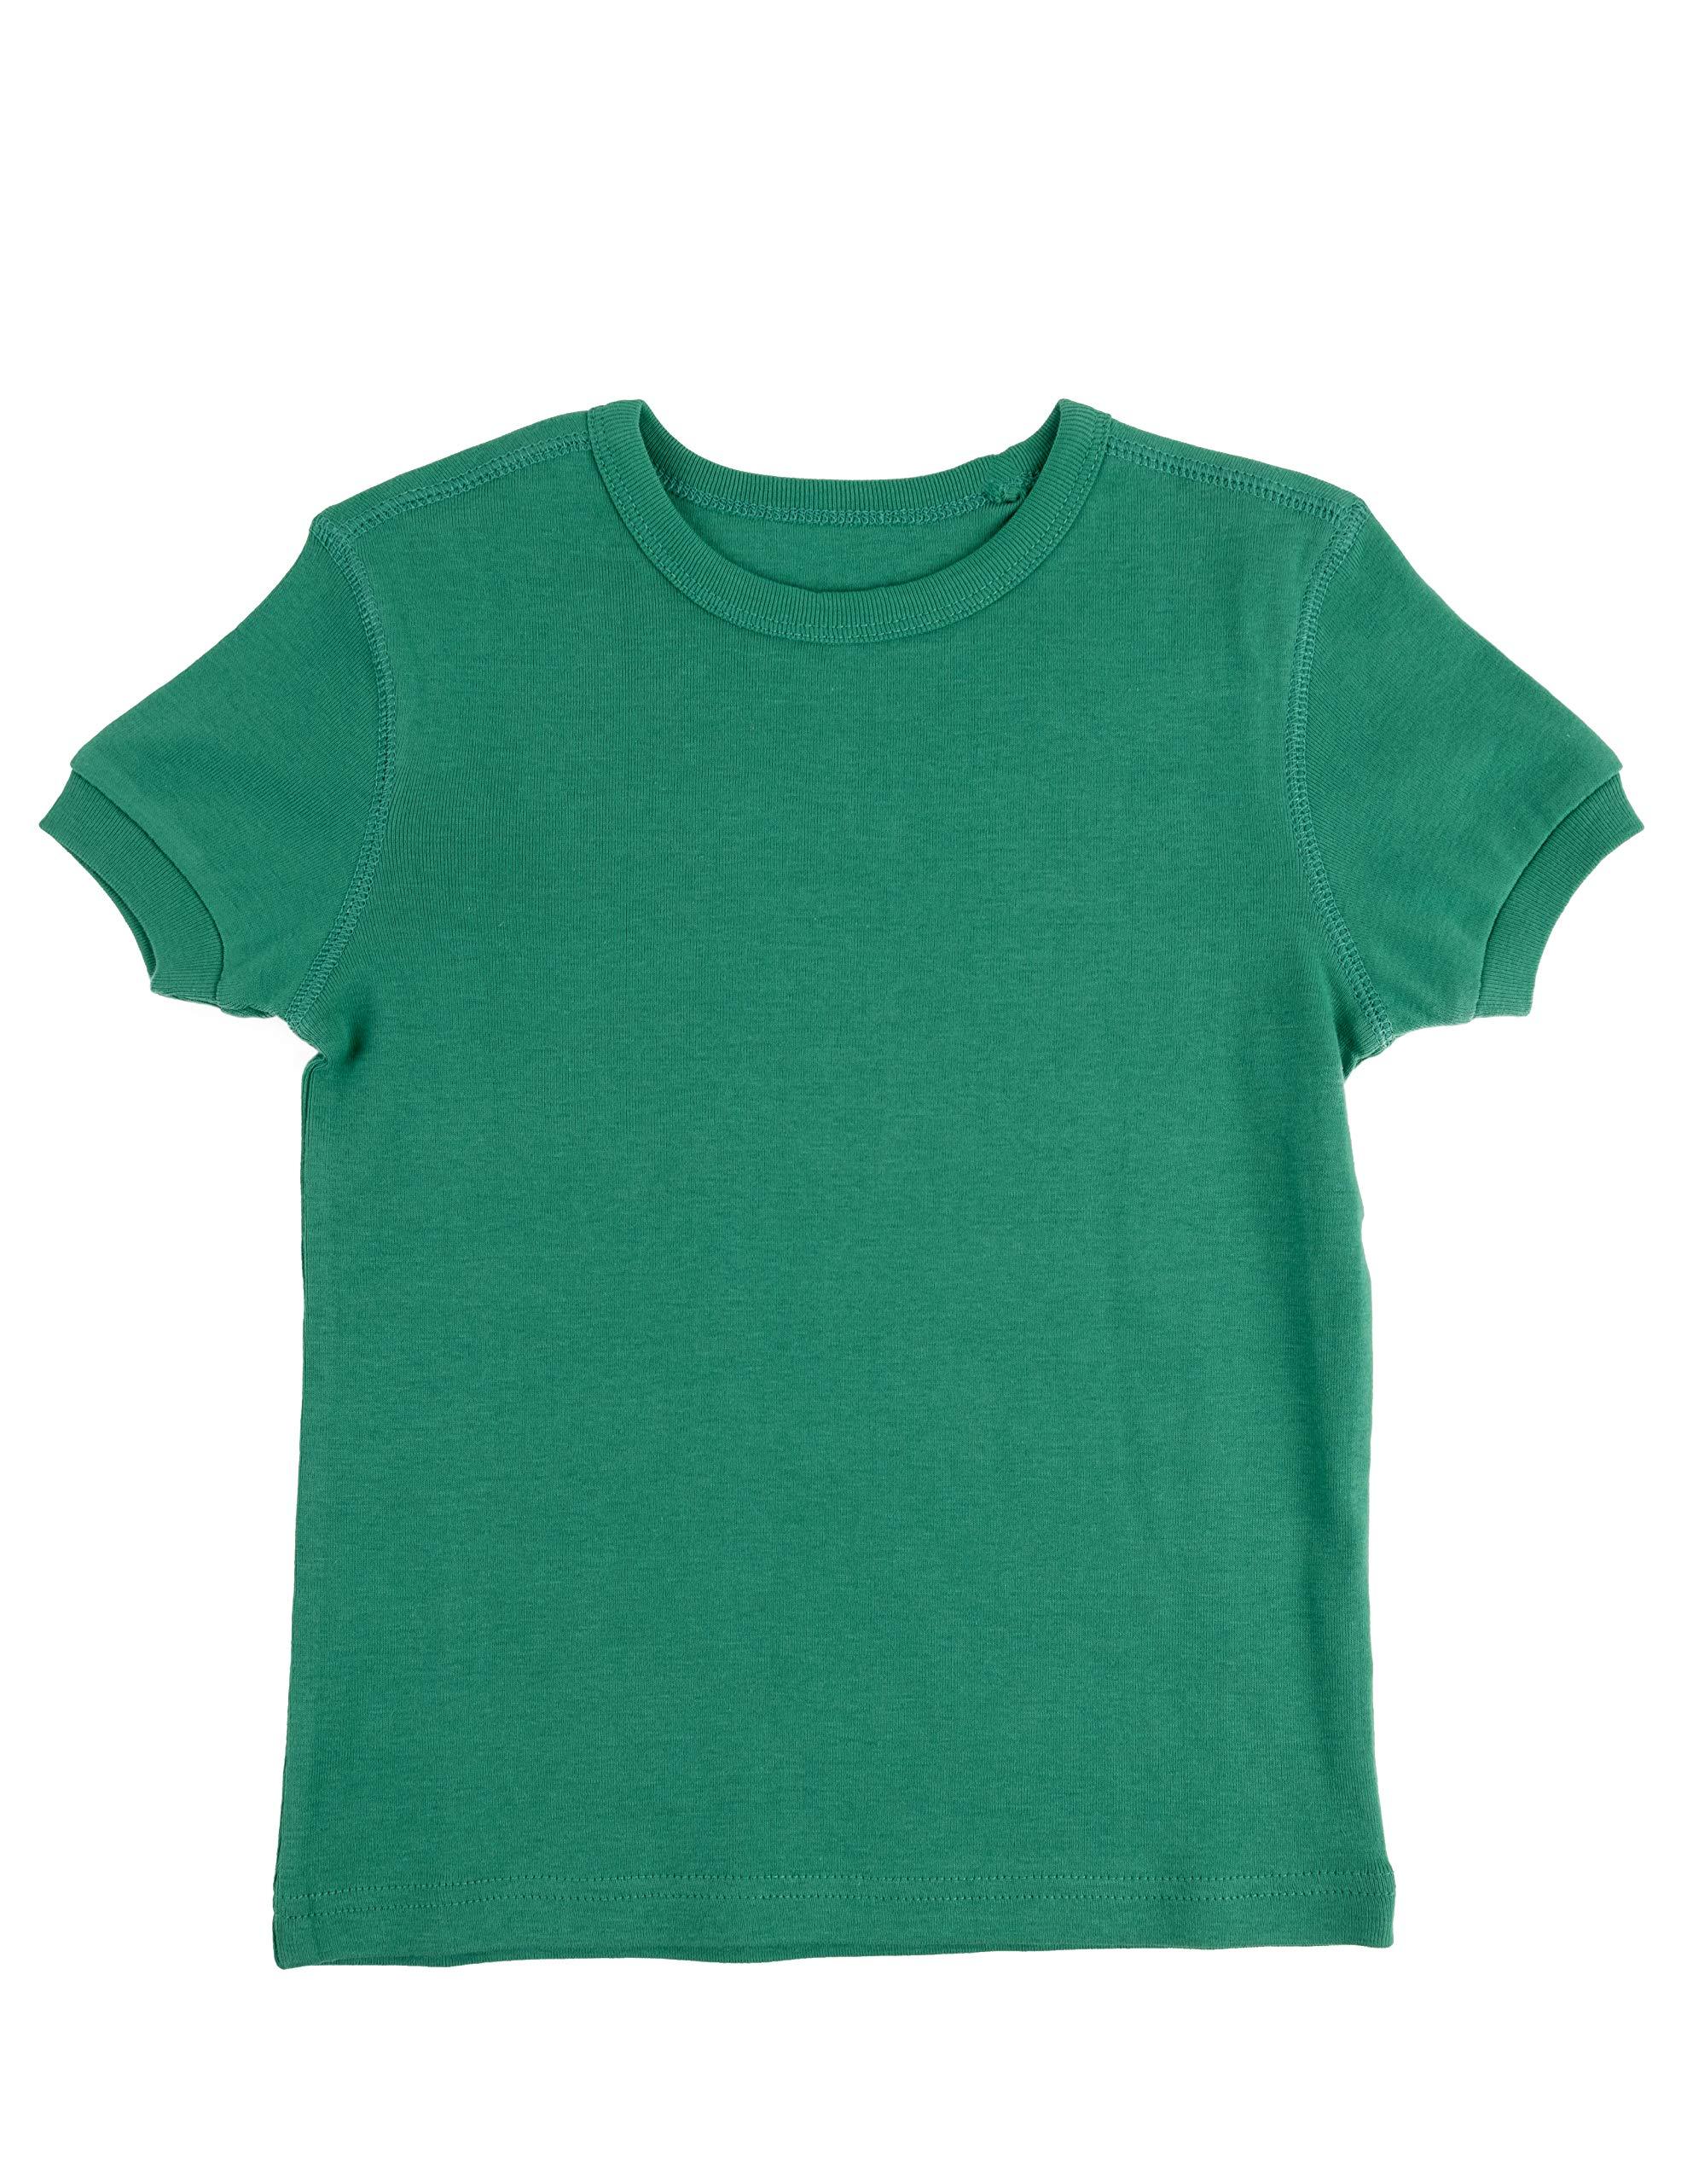 thumbnail 9 - Leveret-Short-Sleeve-Boys-Girls-Kids-amp-Toddler-T-Shirt-100-Cotton-2-14-Years